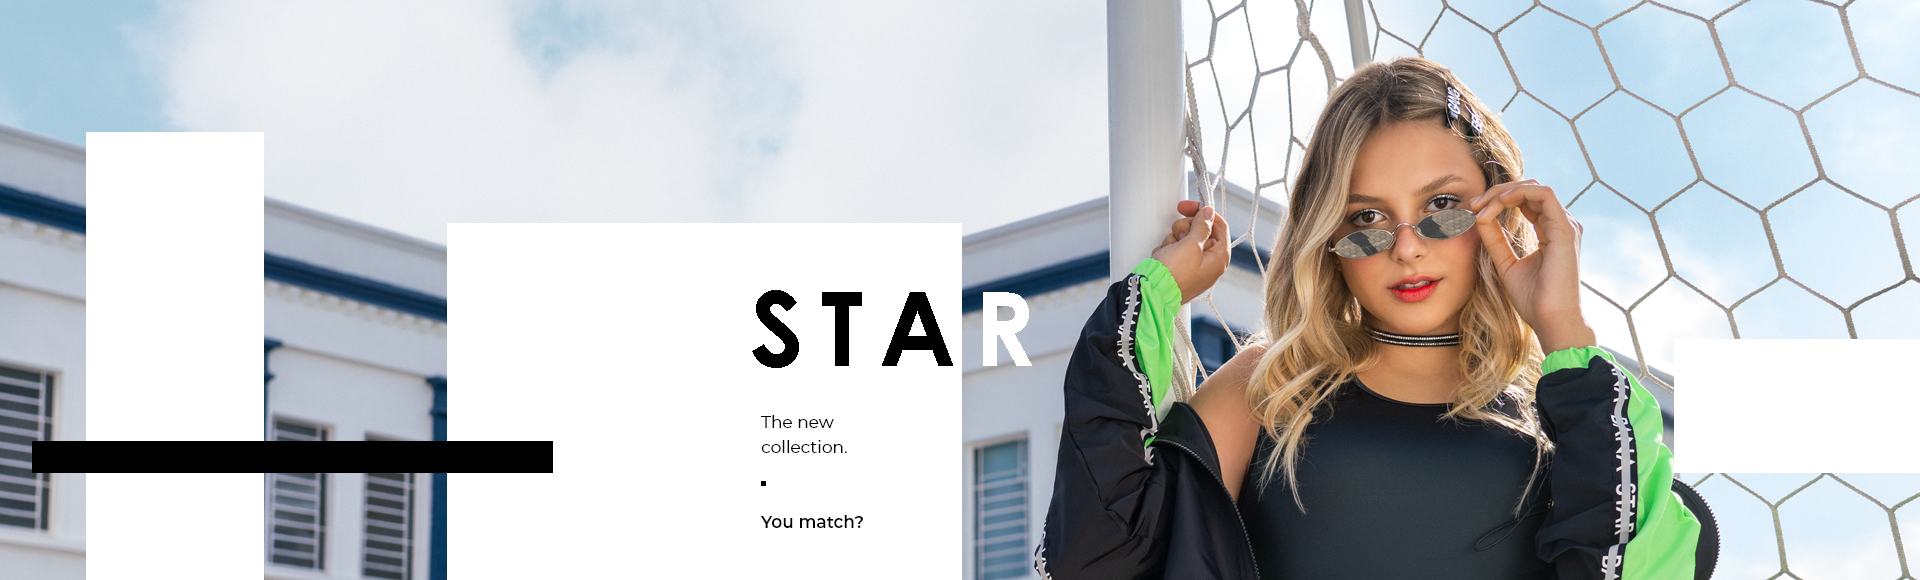 Banner-bb-star